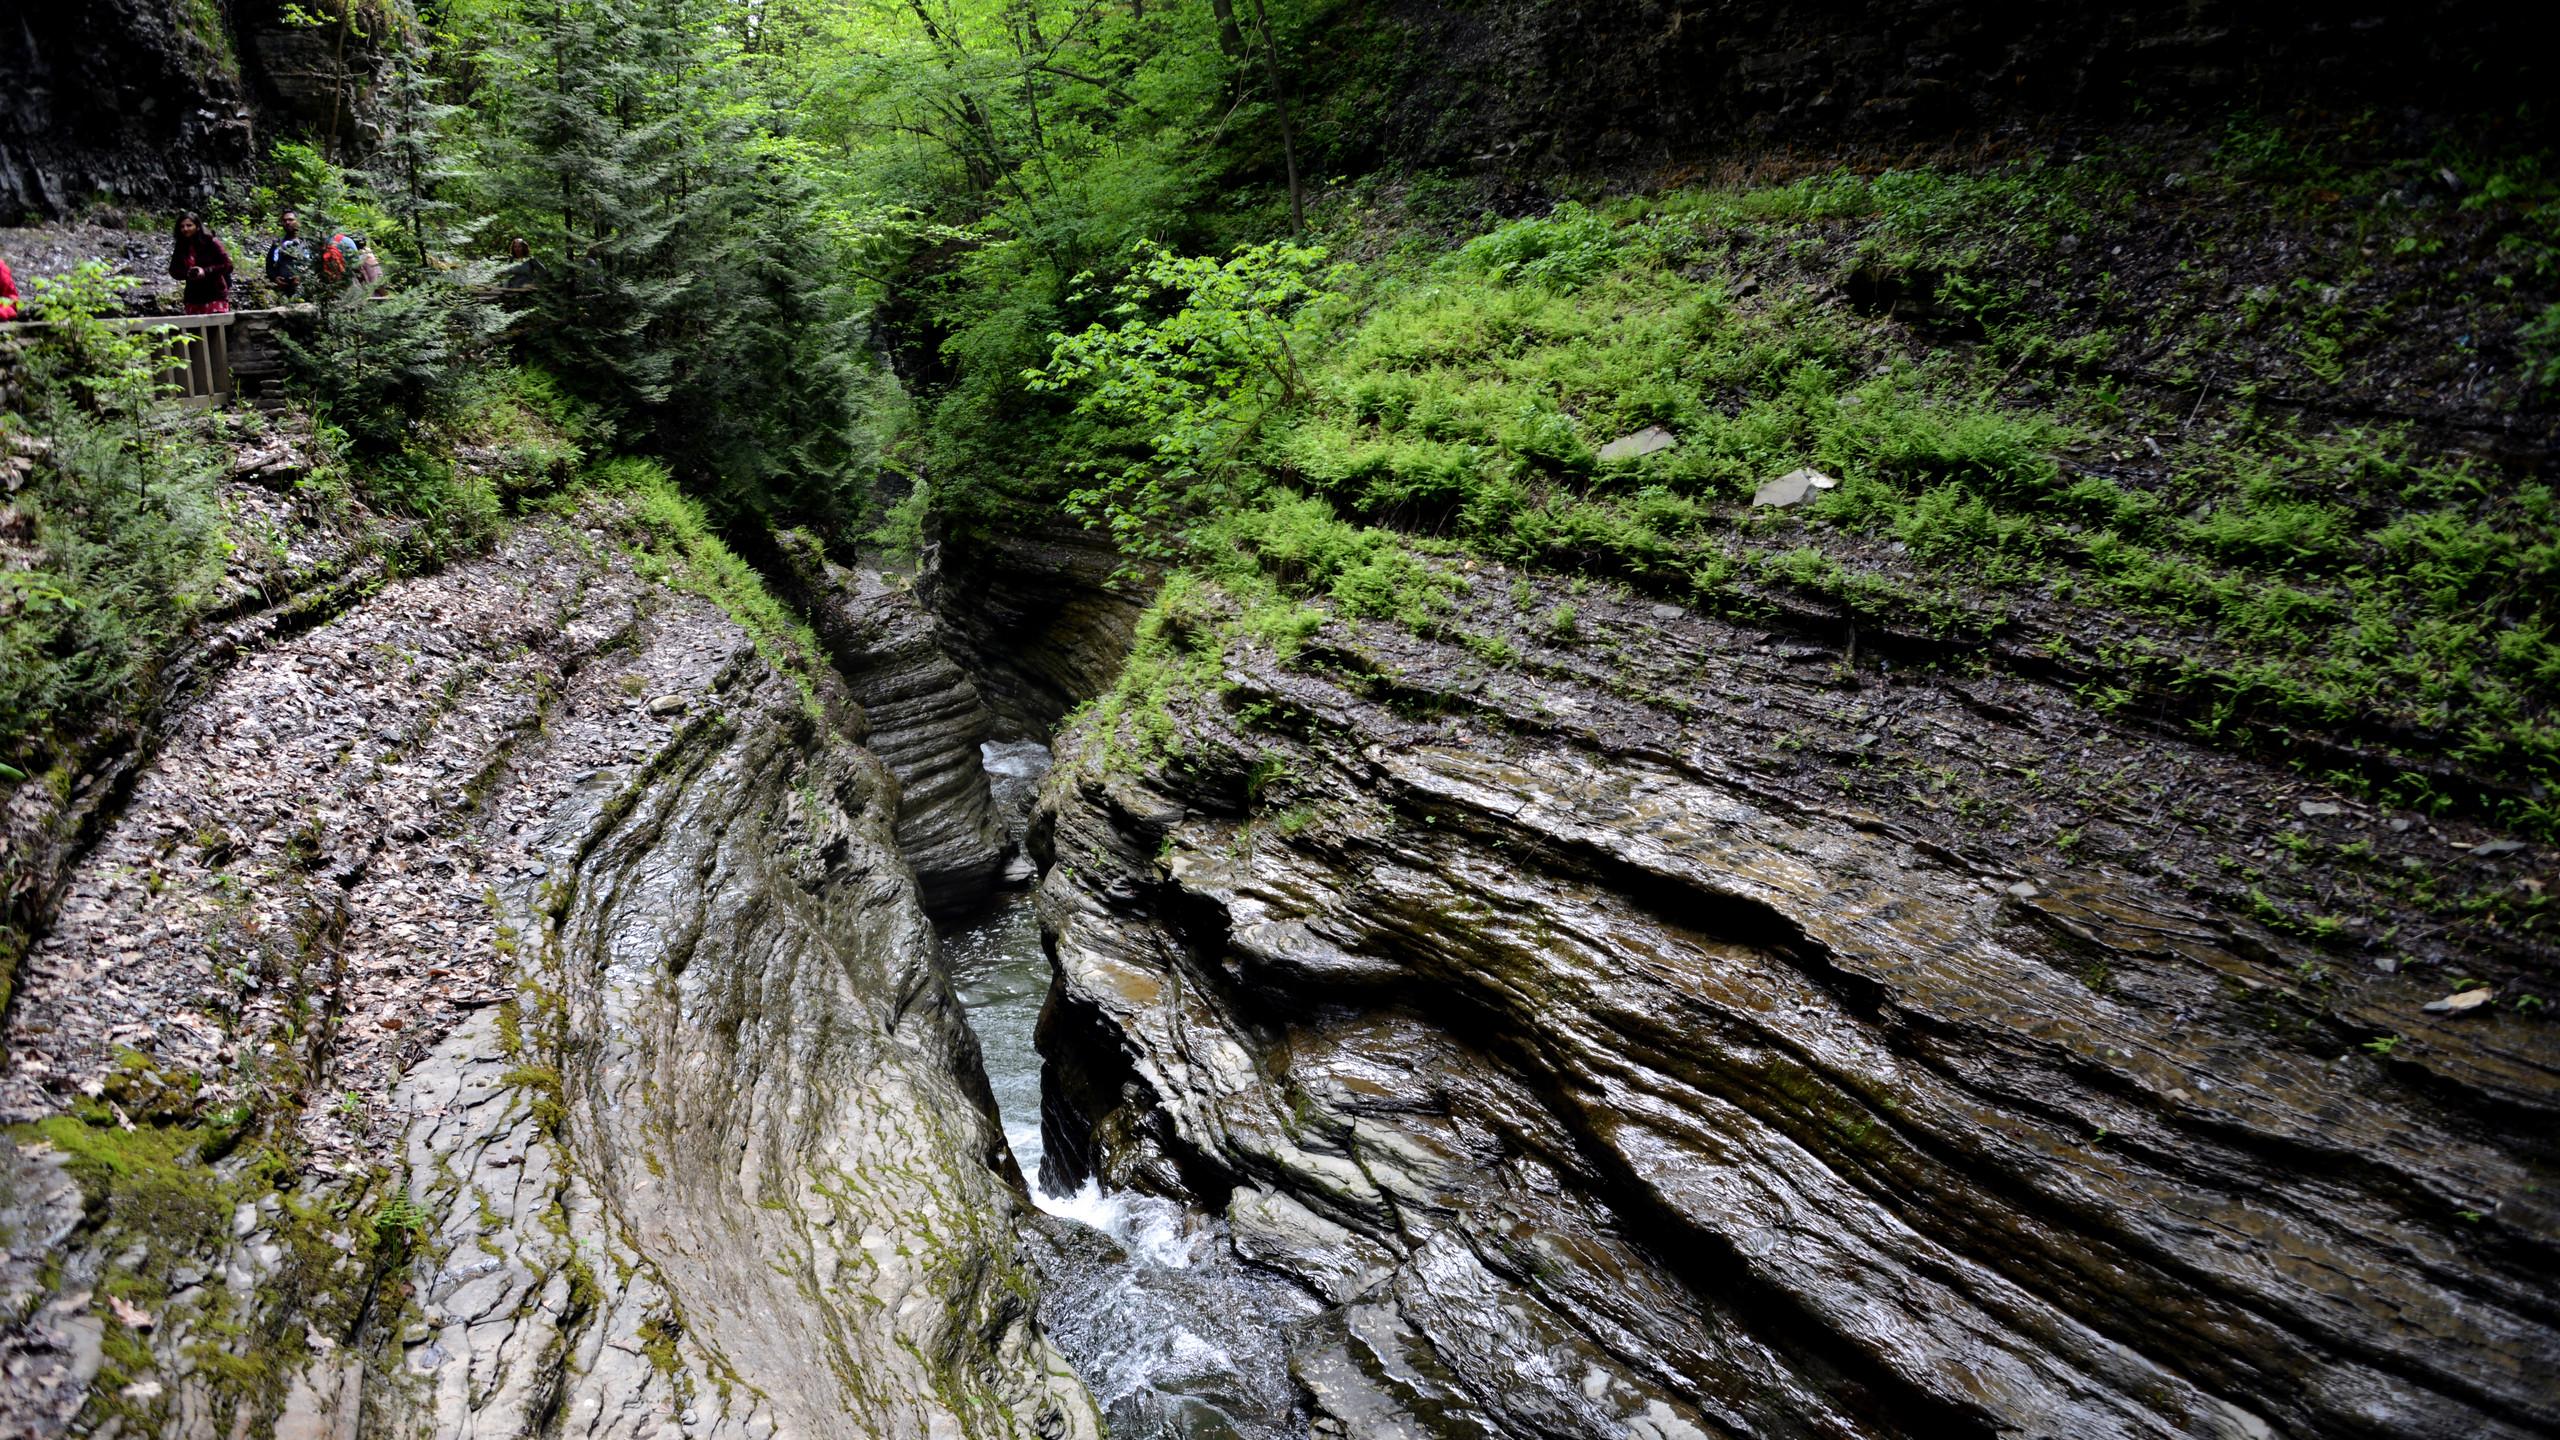 Layered Erosion